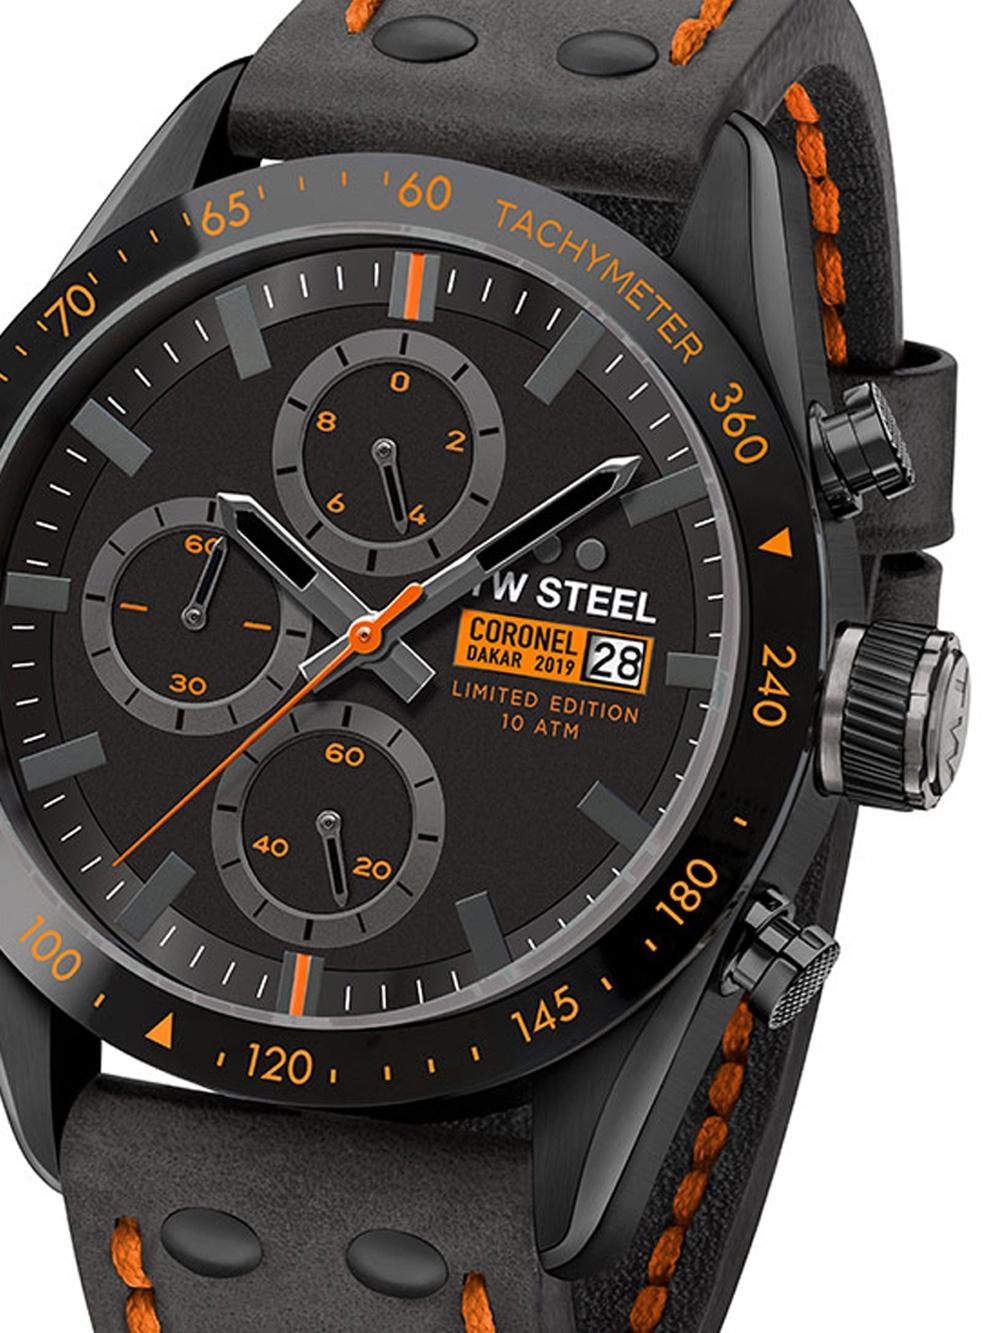 TW996 Dakar Ltd. Chronograph 46mm 10ATM